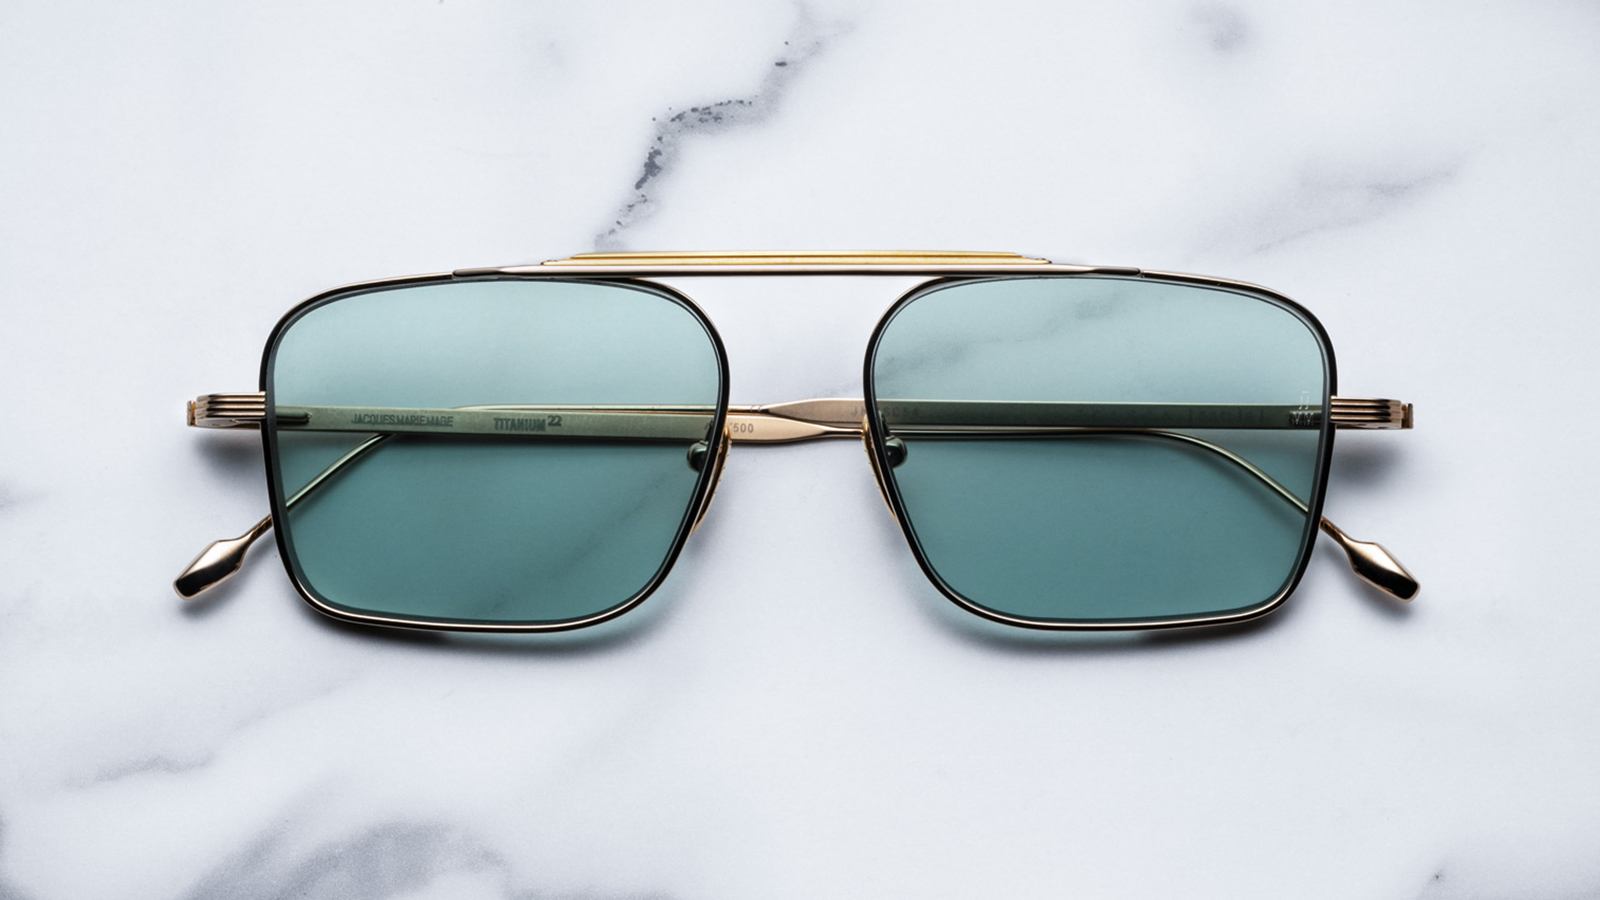 Jacques Marie Mage Scarpa Sunglasses